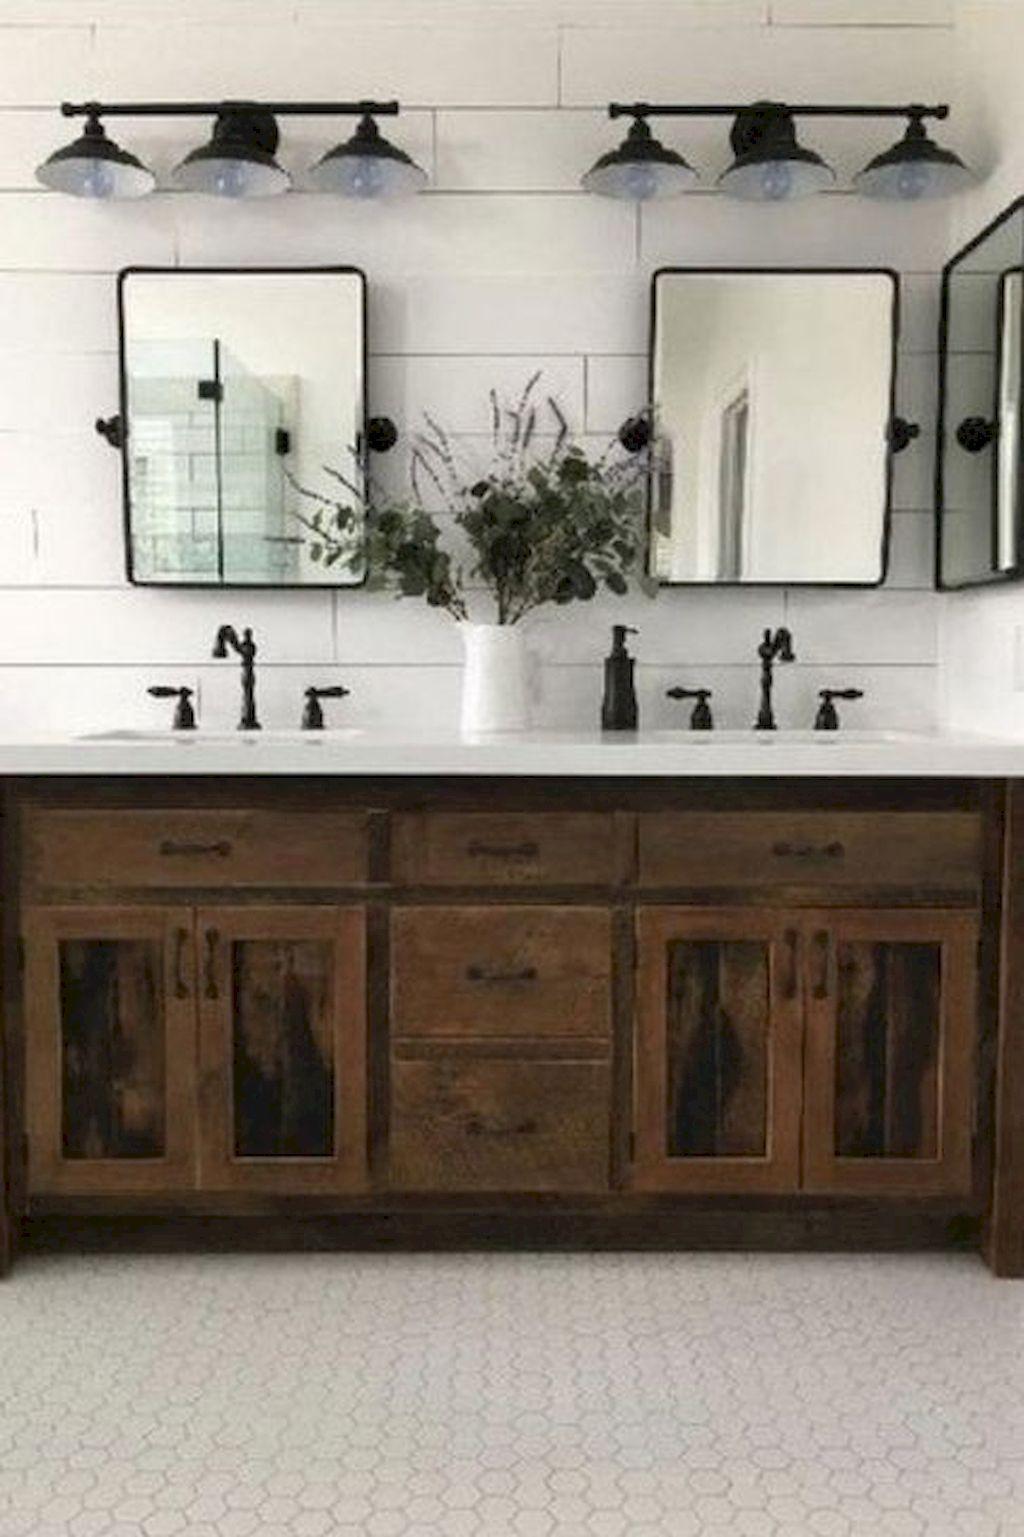 Cool 90 Beautiful Farmhouse Bathroom Remodel Ideas Https Homespecially Com 90 Beautiful Farmh Rustic Bathroom Designs Rustic Bathroom Decor Bathrooms Remodel [ 1537 x 1024 Pixel ]